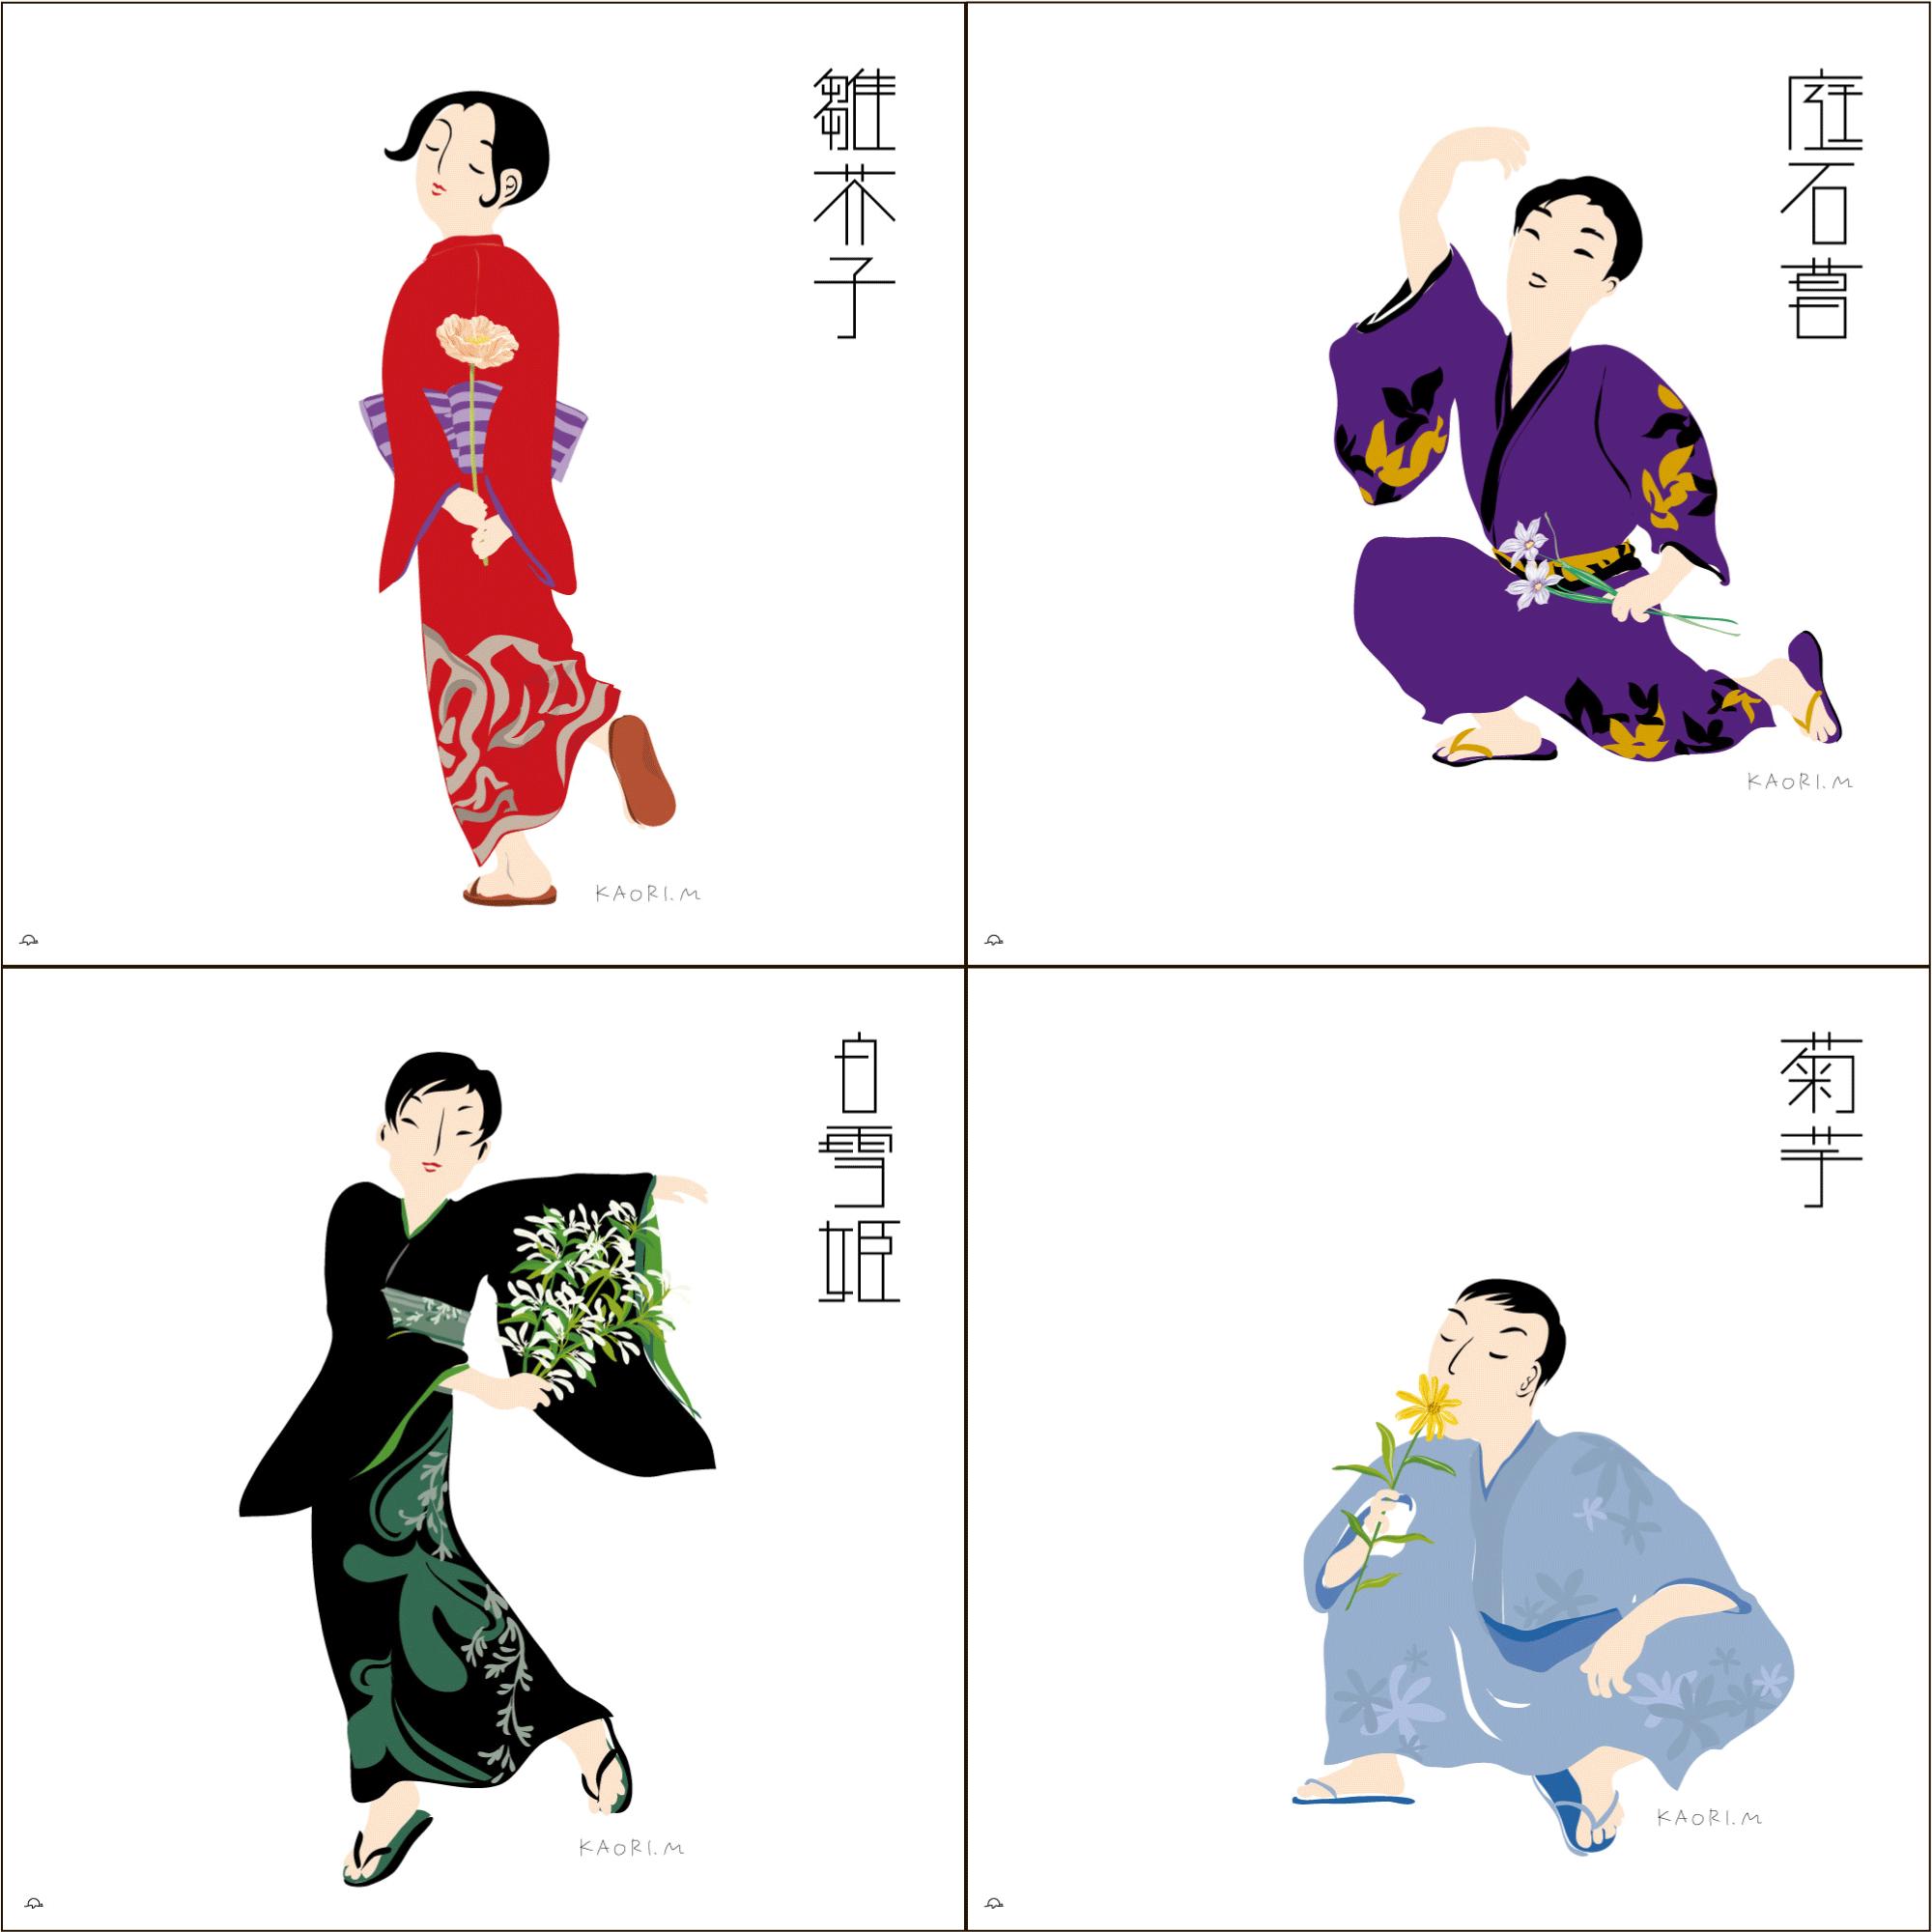 宮田香里 四季の花